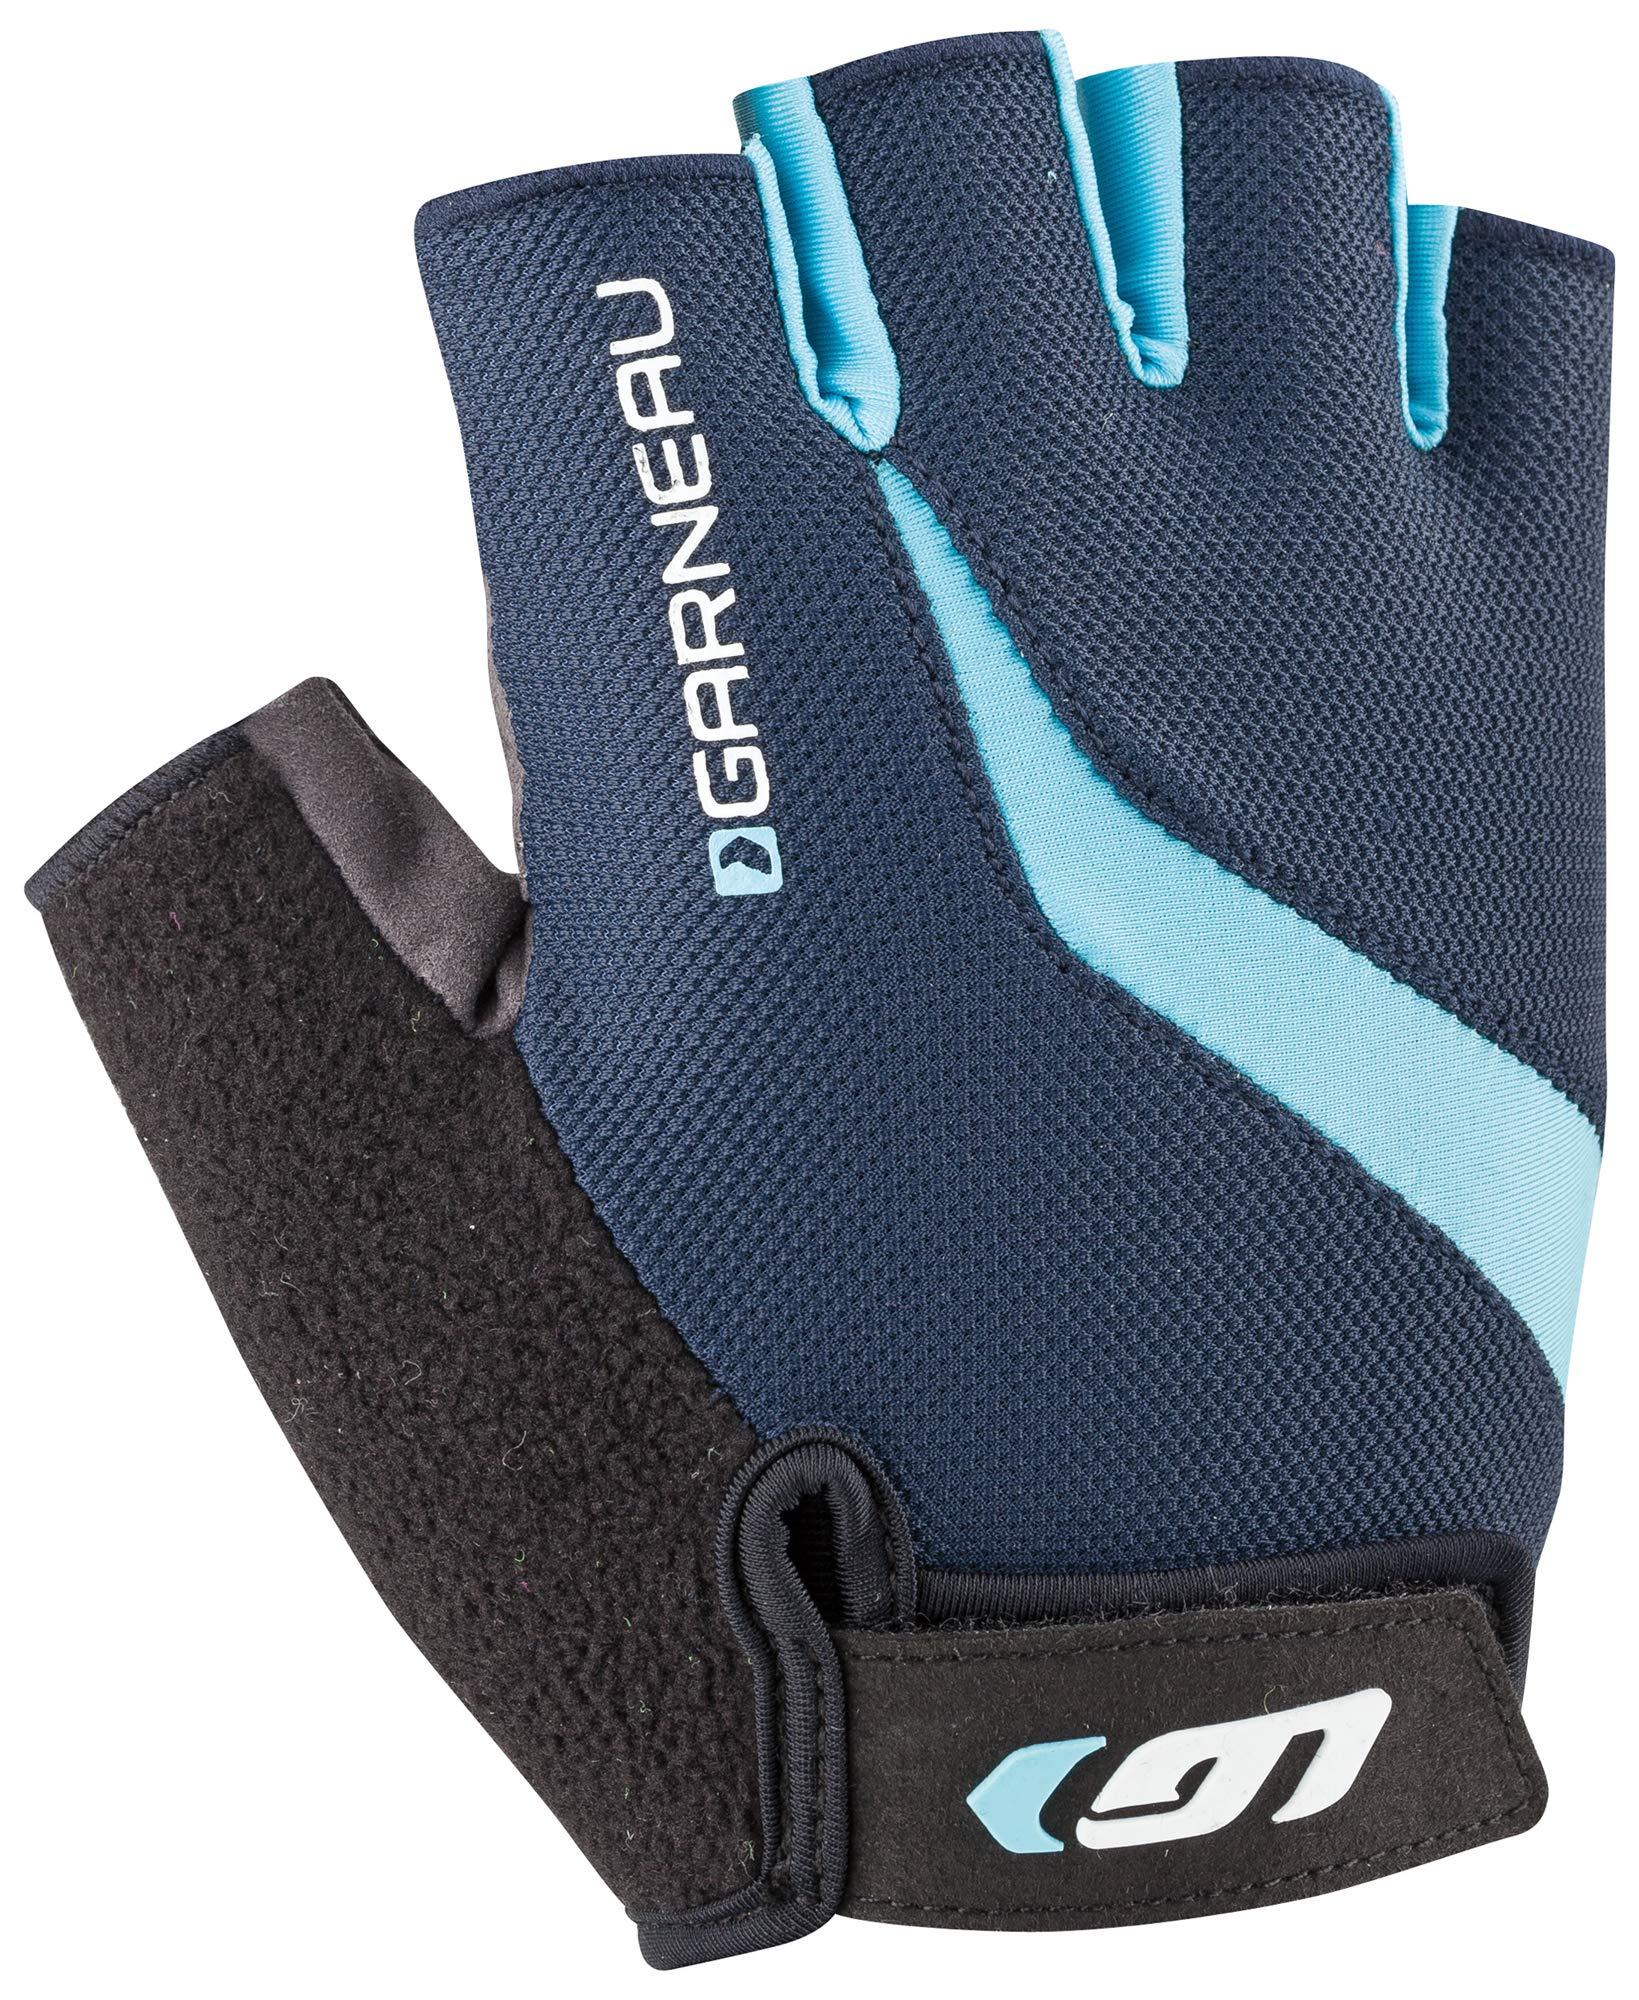 Louis Garneau Men's Biogel RX-V Bike Gloves, Royal, X-Small